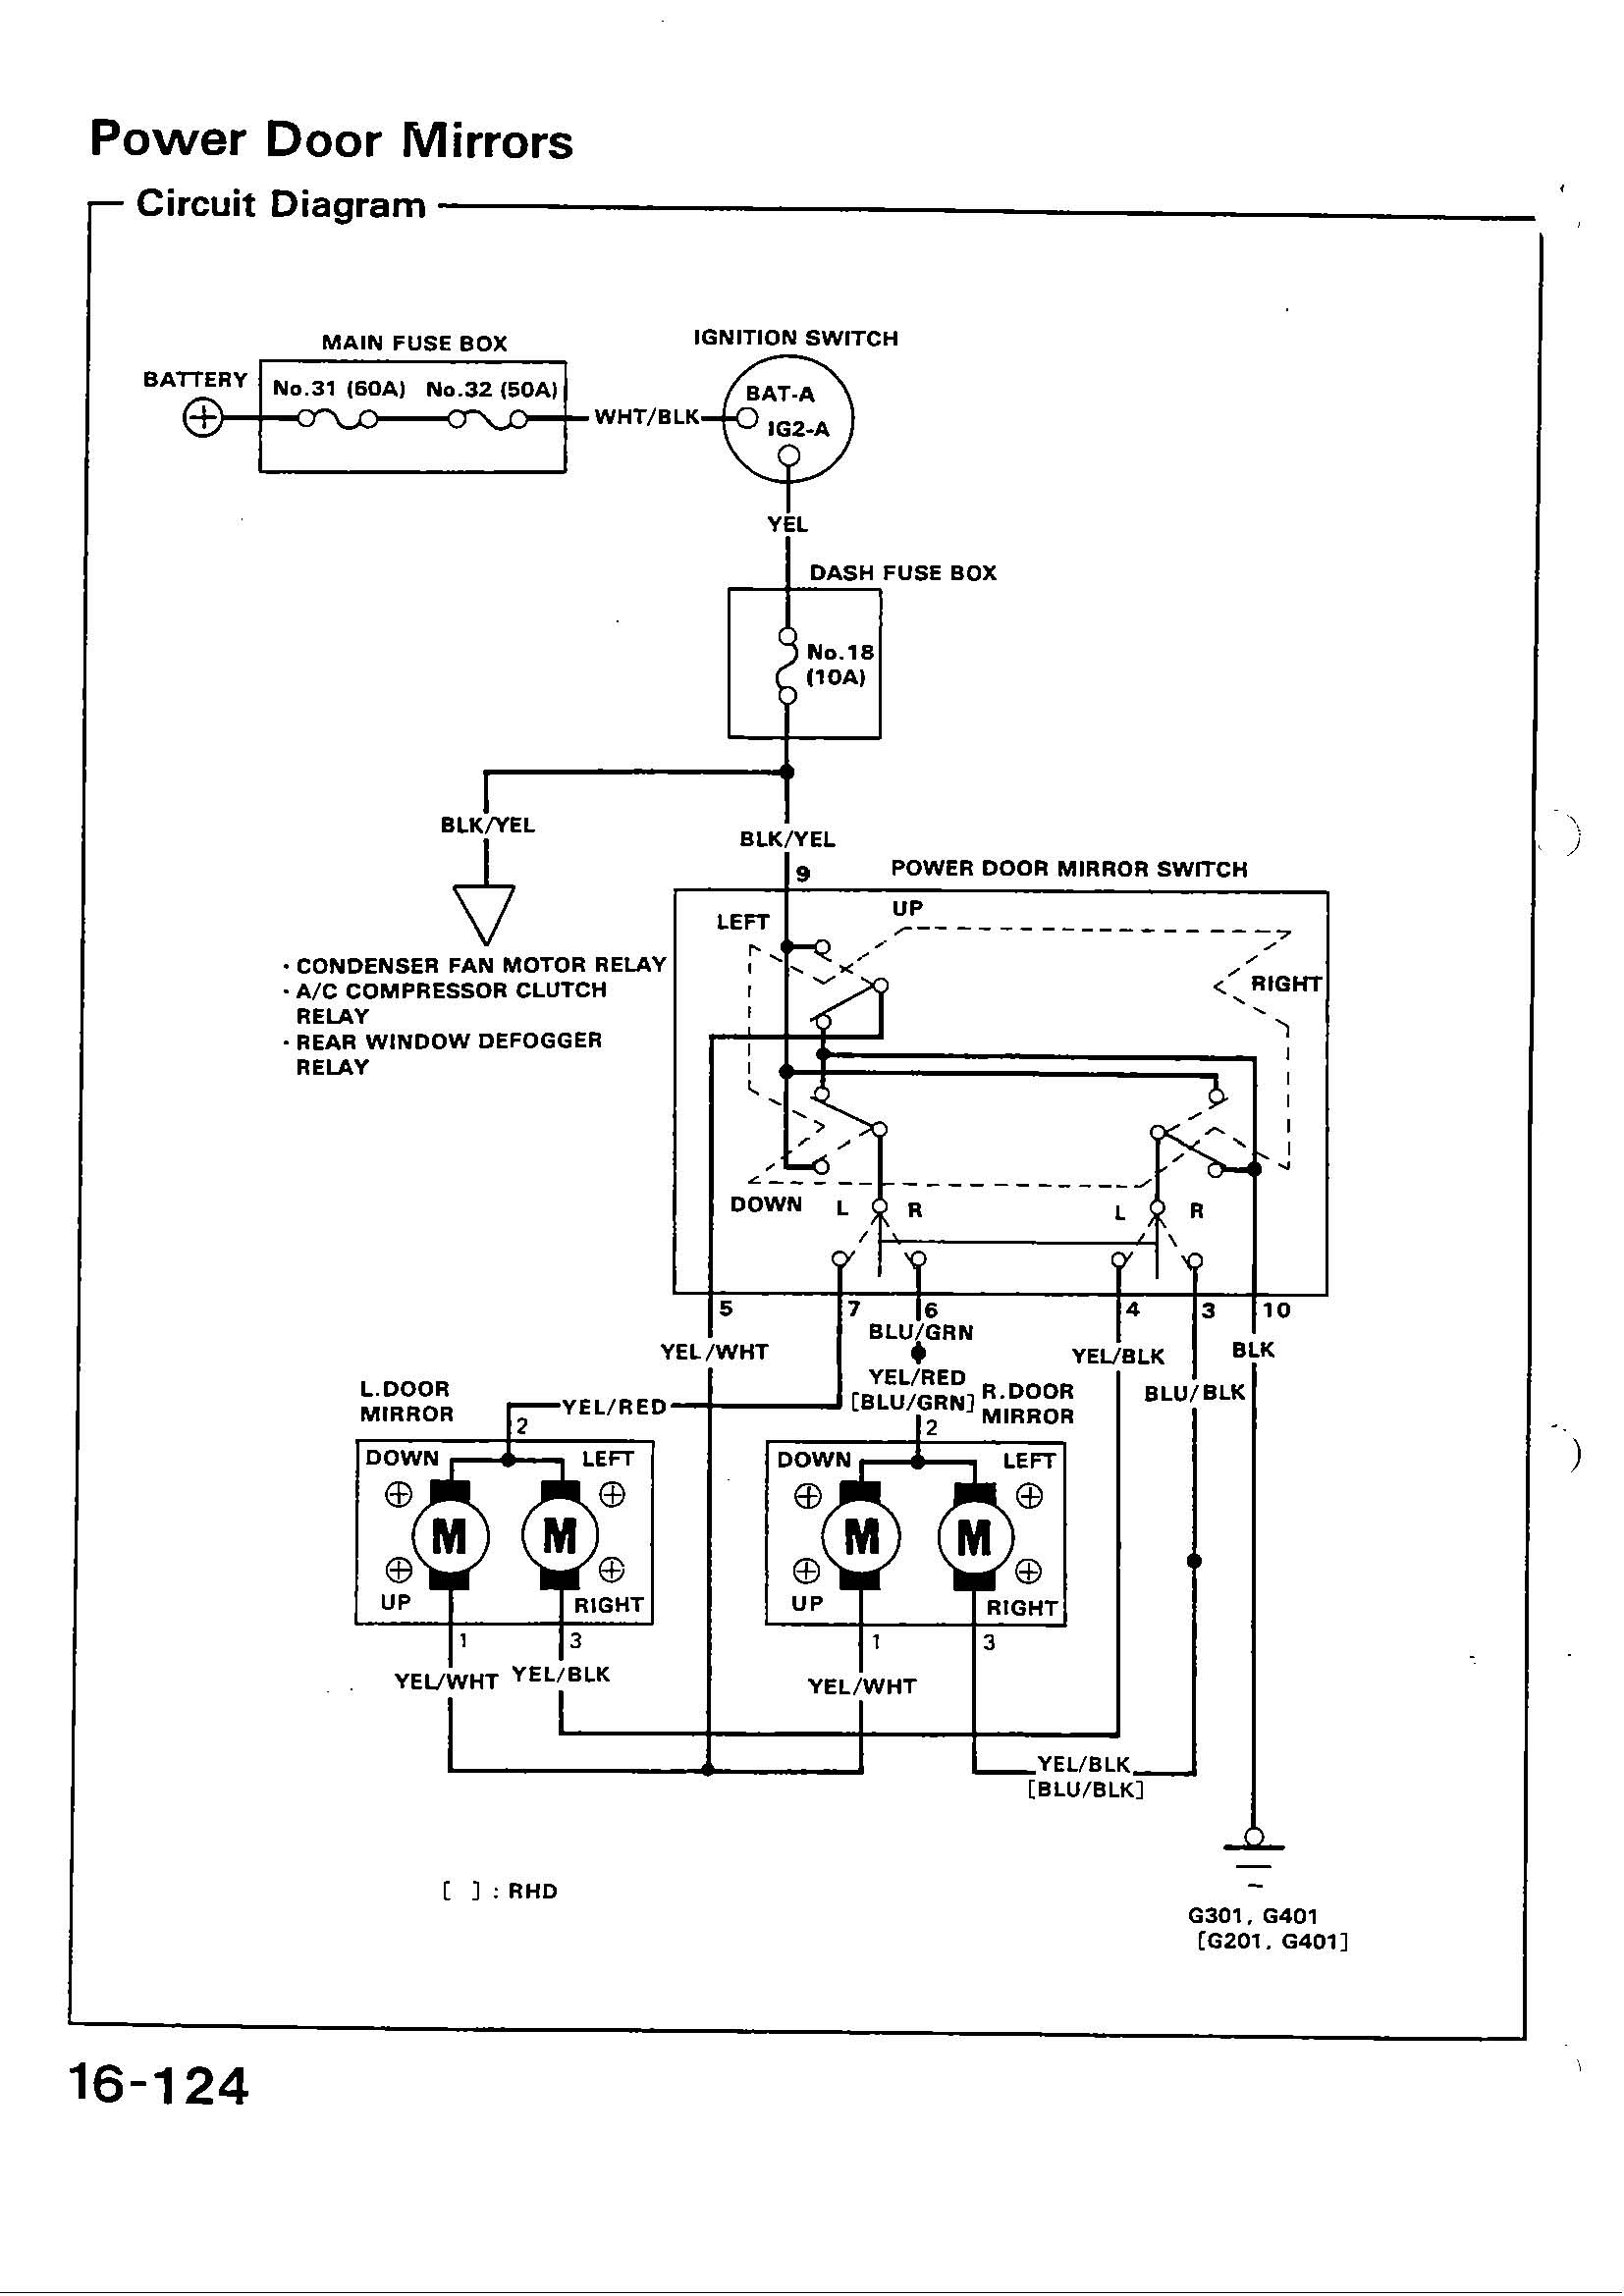 91CIVICPOWERMIRRORS?resize=665%2C940 diagrams 10001121 crx wiring diagram repair guides wiring crx main relay wiring diagram at reclaimingppi.co